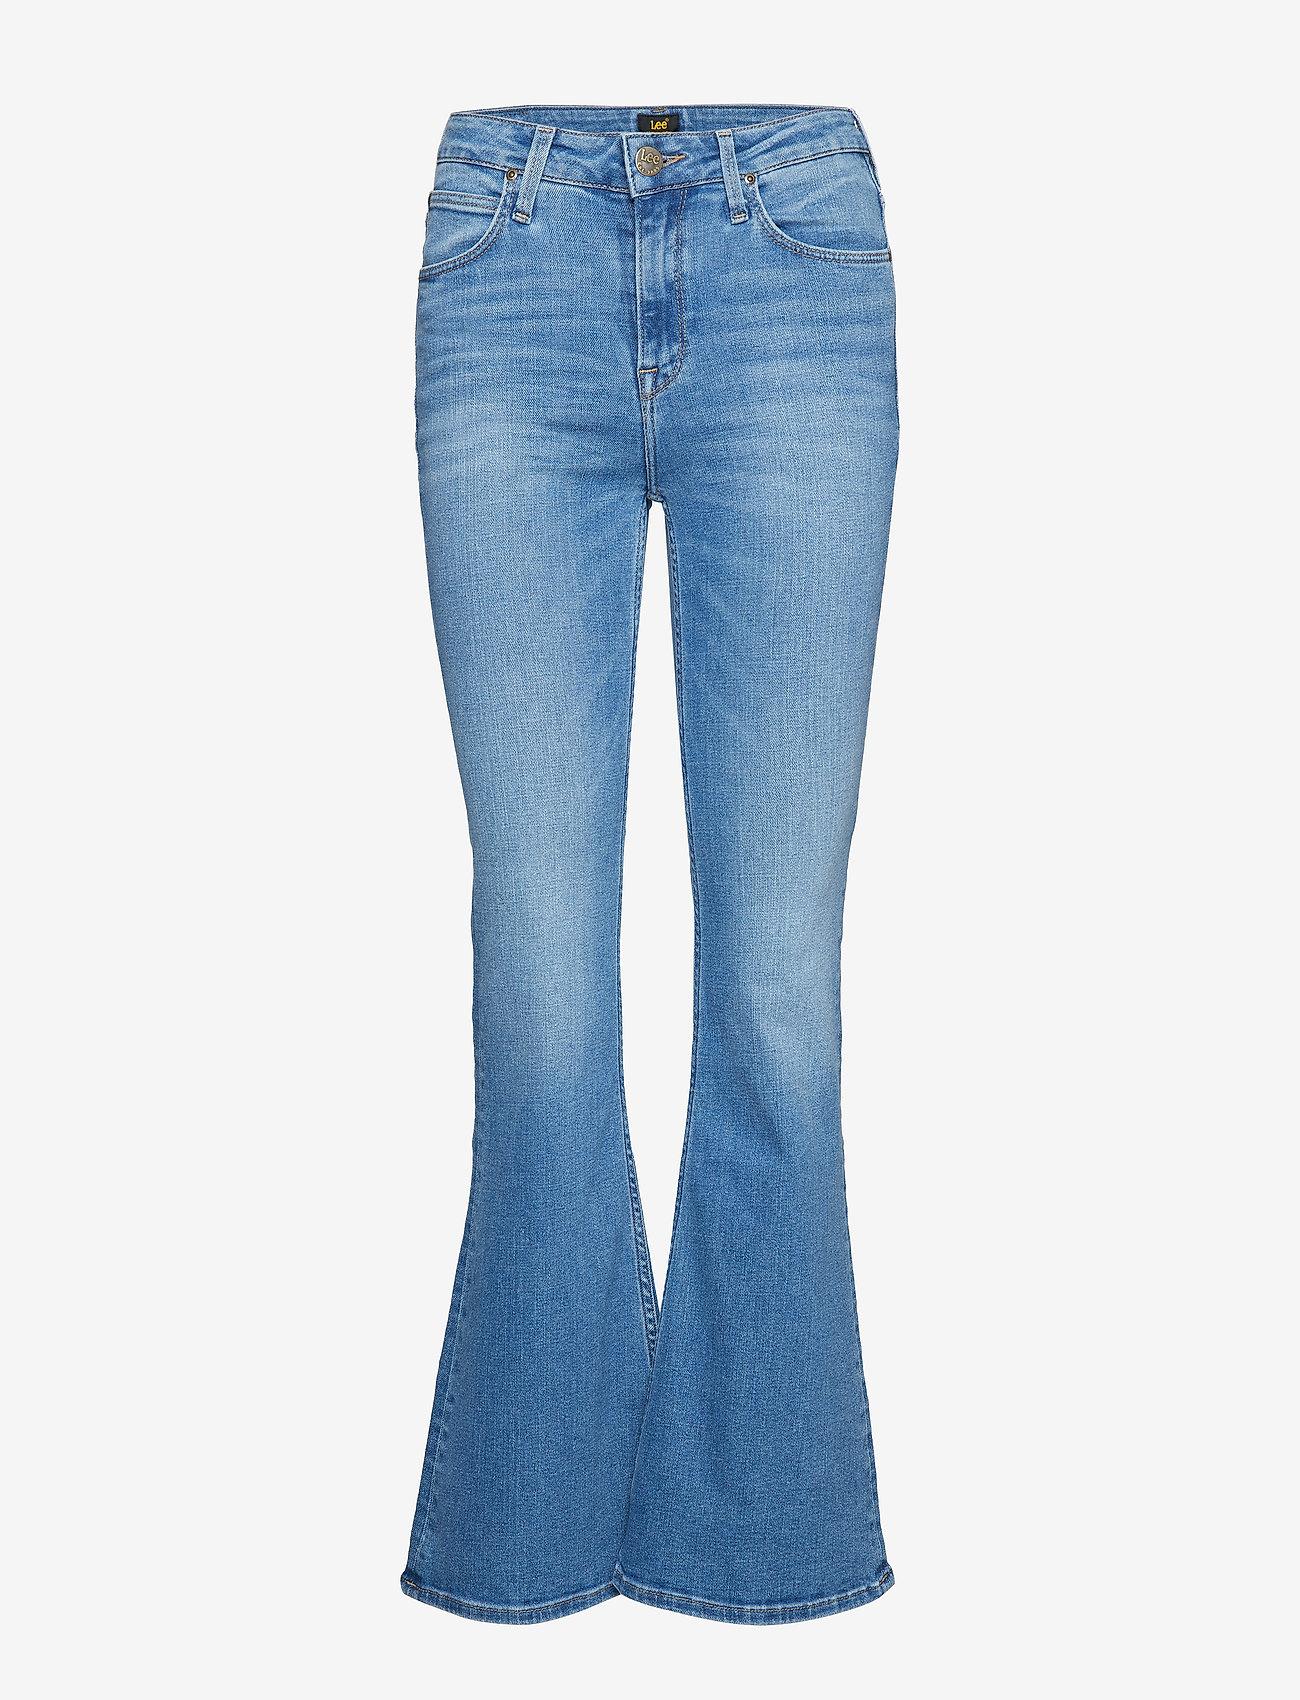 Lee Jeans - BREESE - schlaghosen - jaded - 0